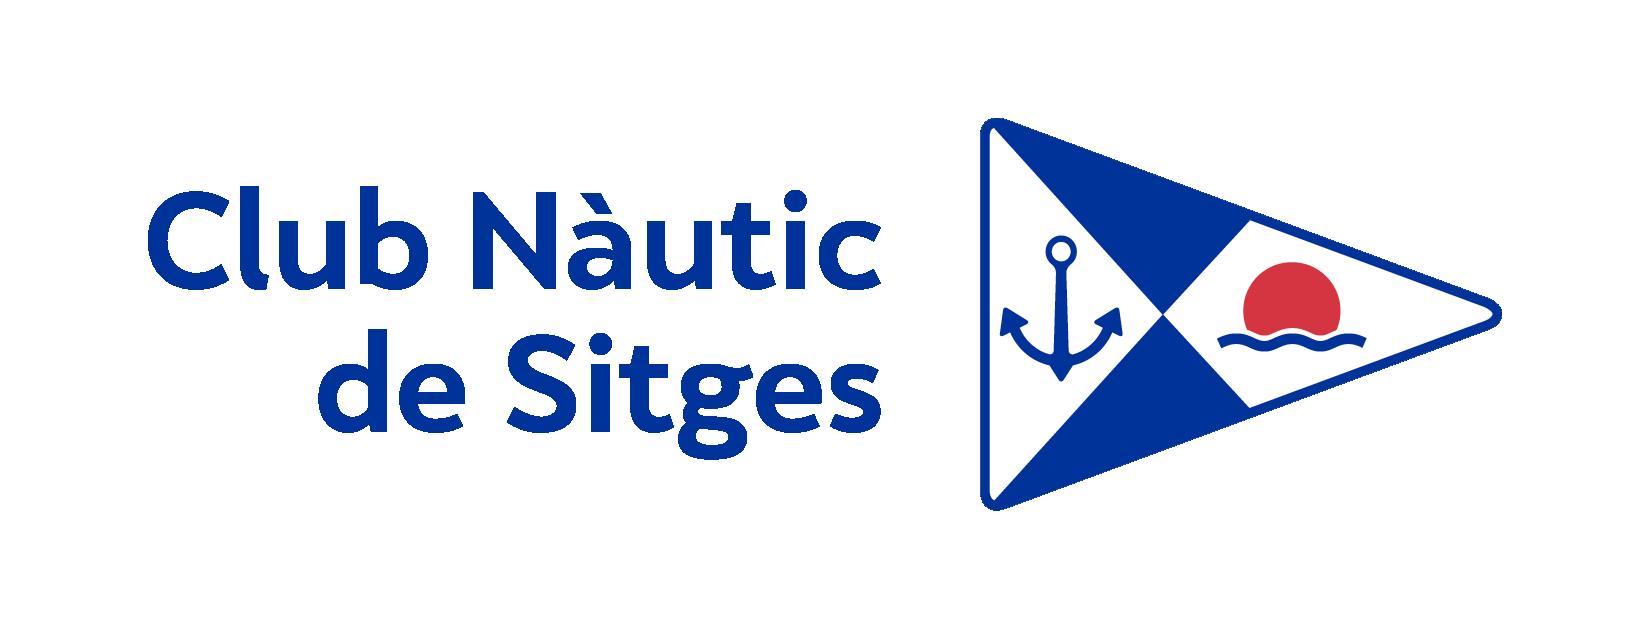 Club Nàutic de Sitges